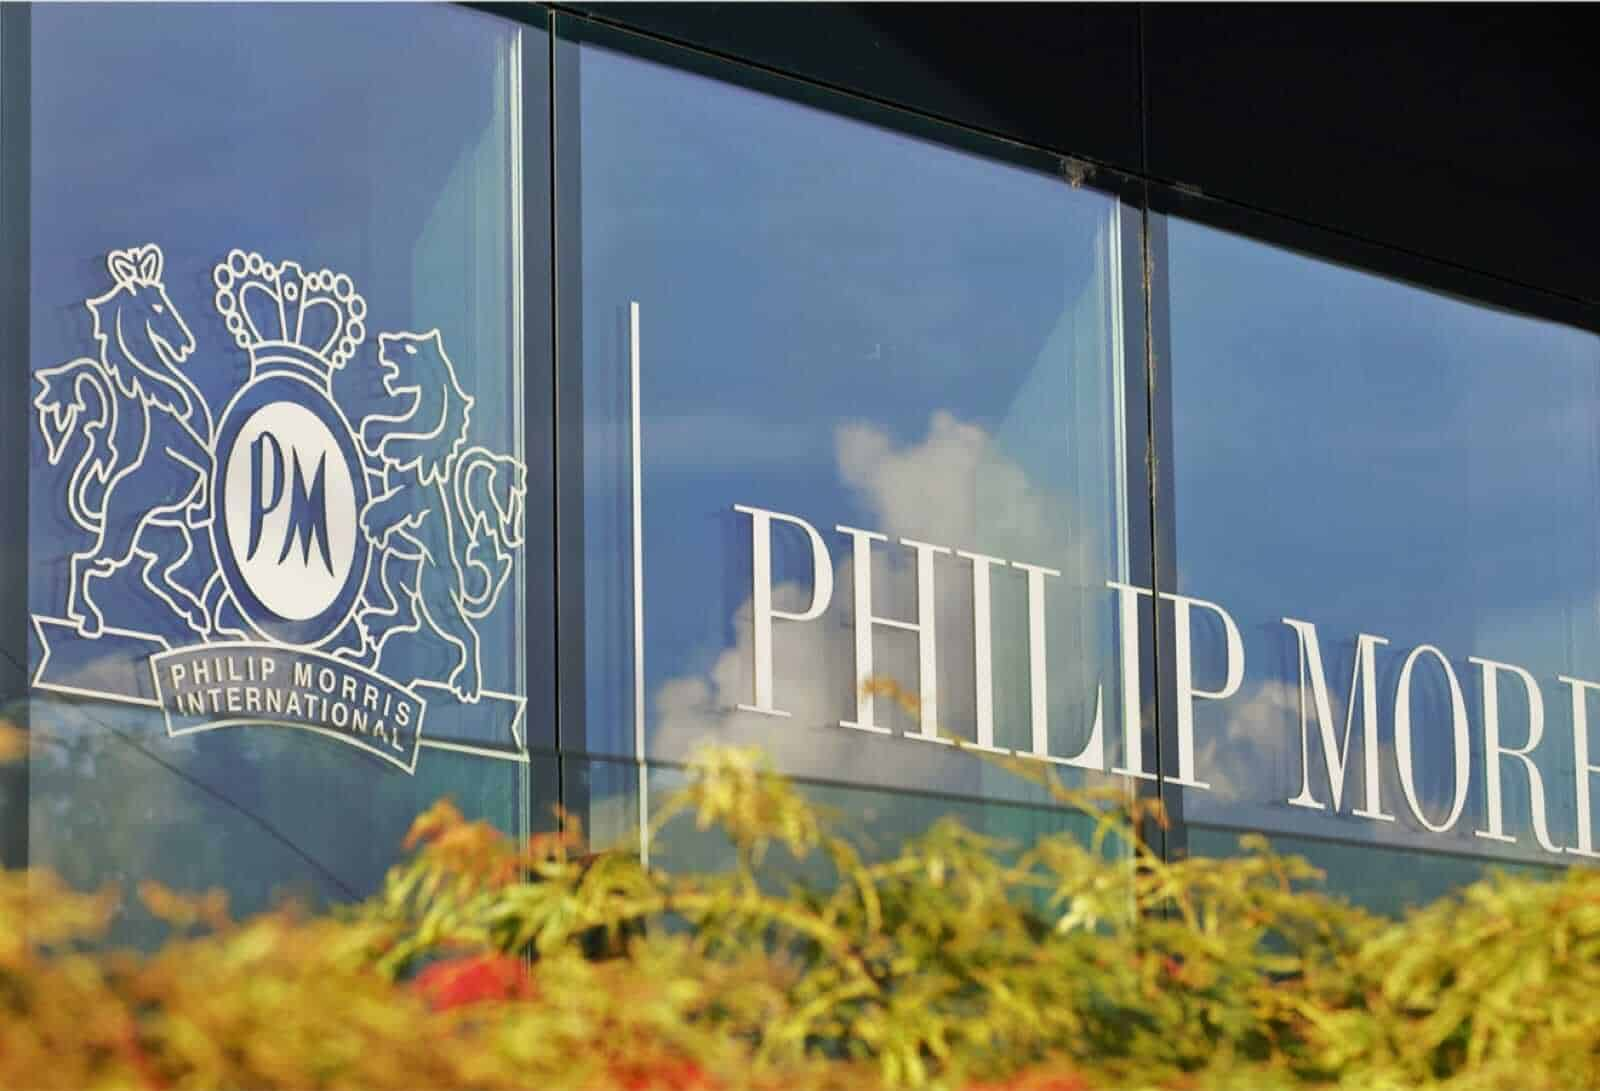 Phillip Morris International, PMI logo on glass window of building